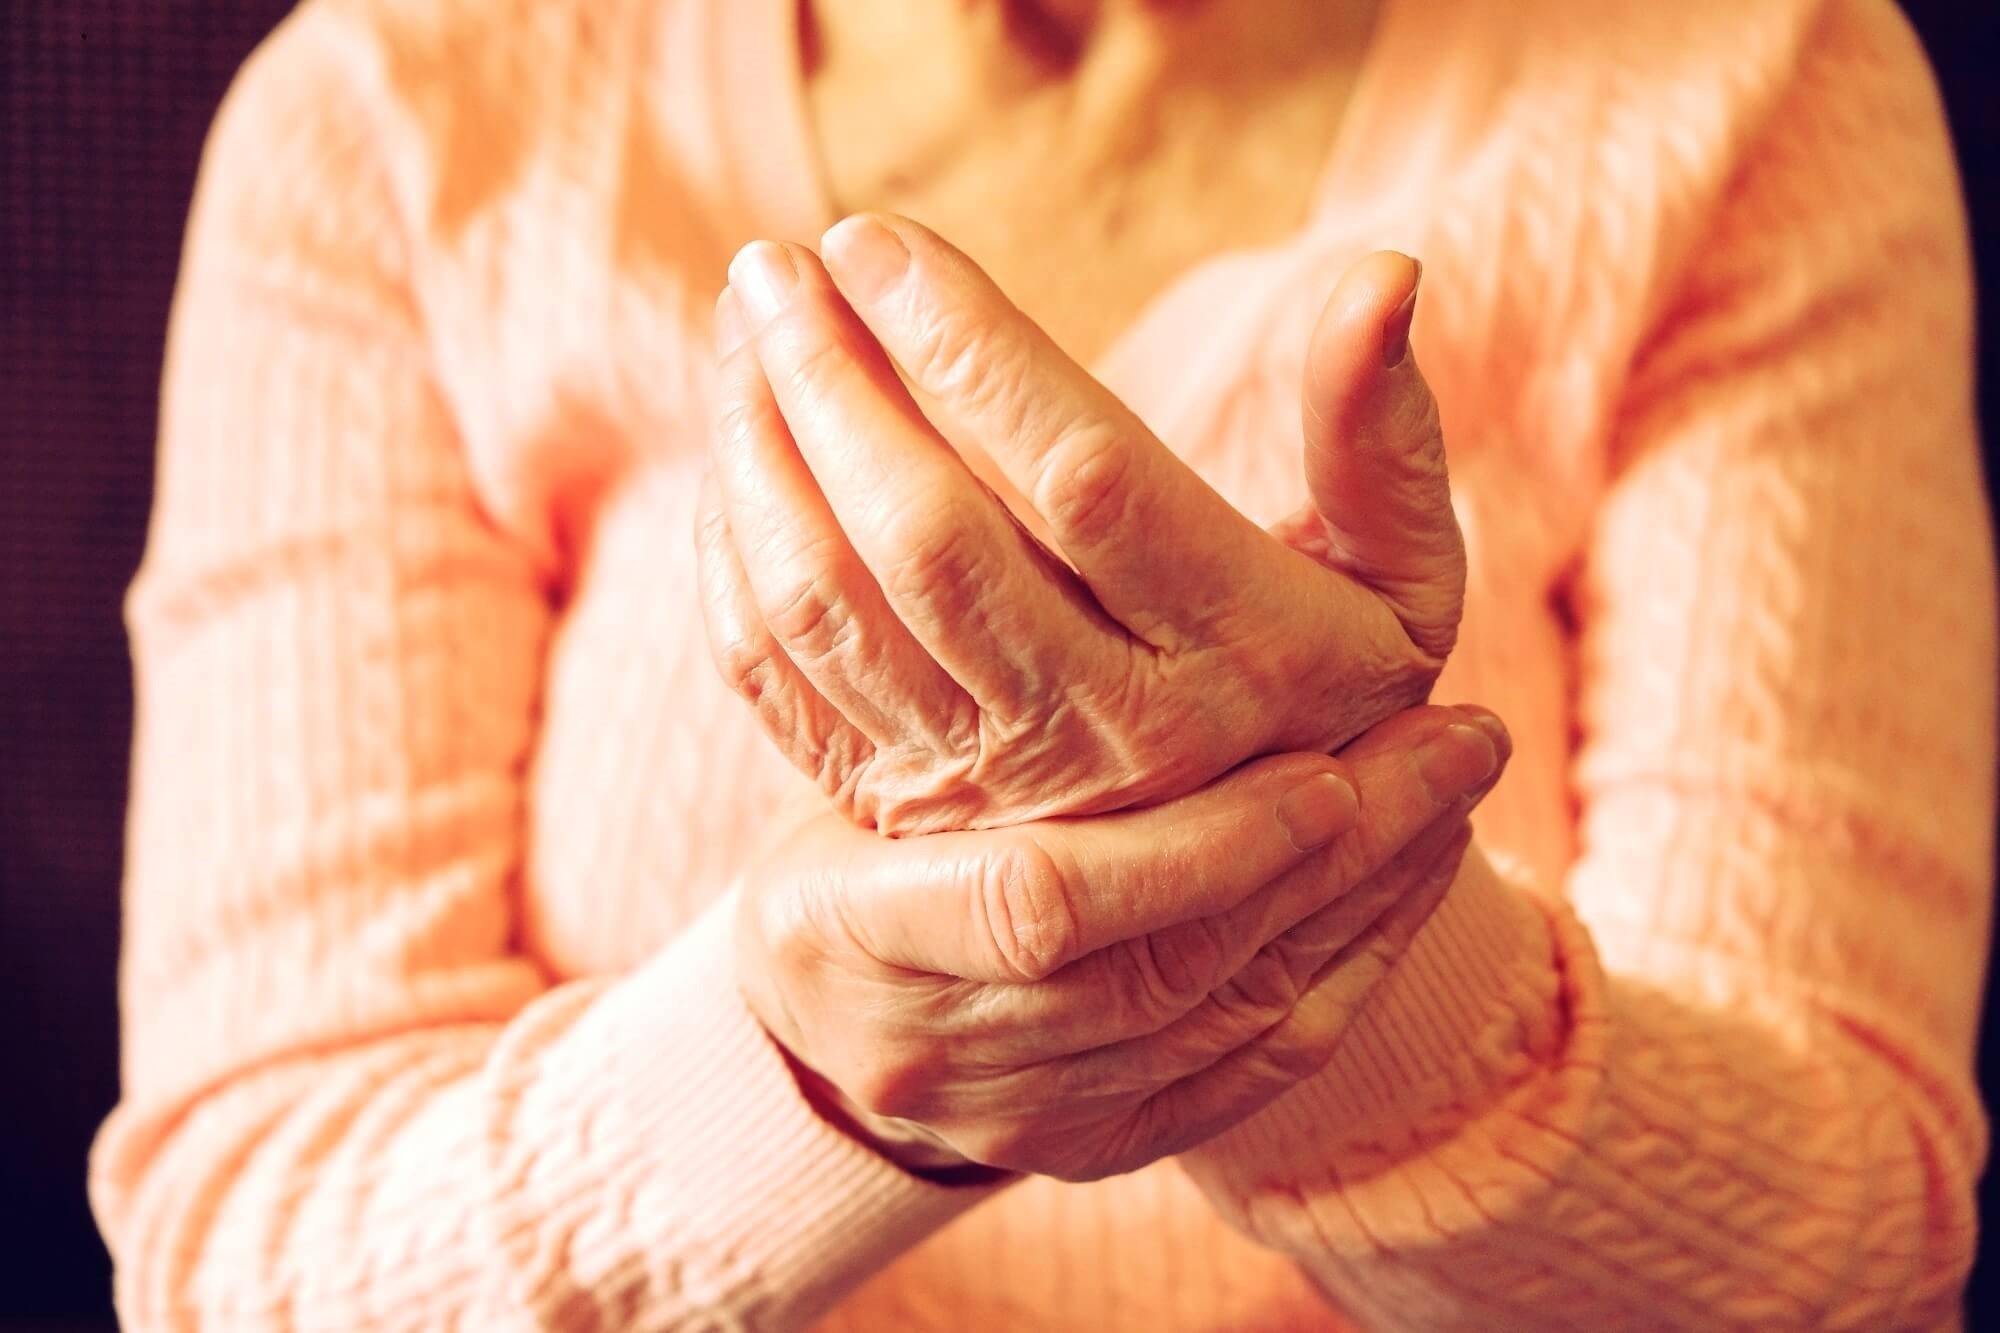 Prevalence of RA-Associated Autoantibodies Not Associated With Erosive Hand Osteoarthritis